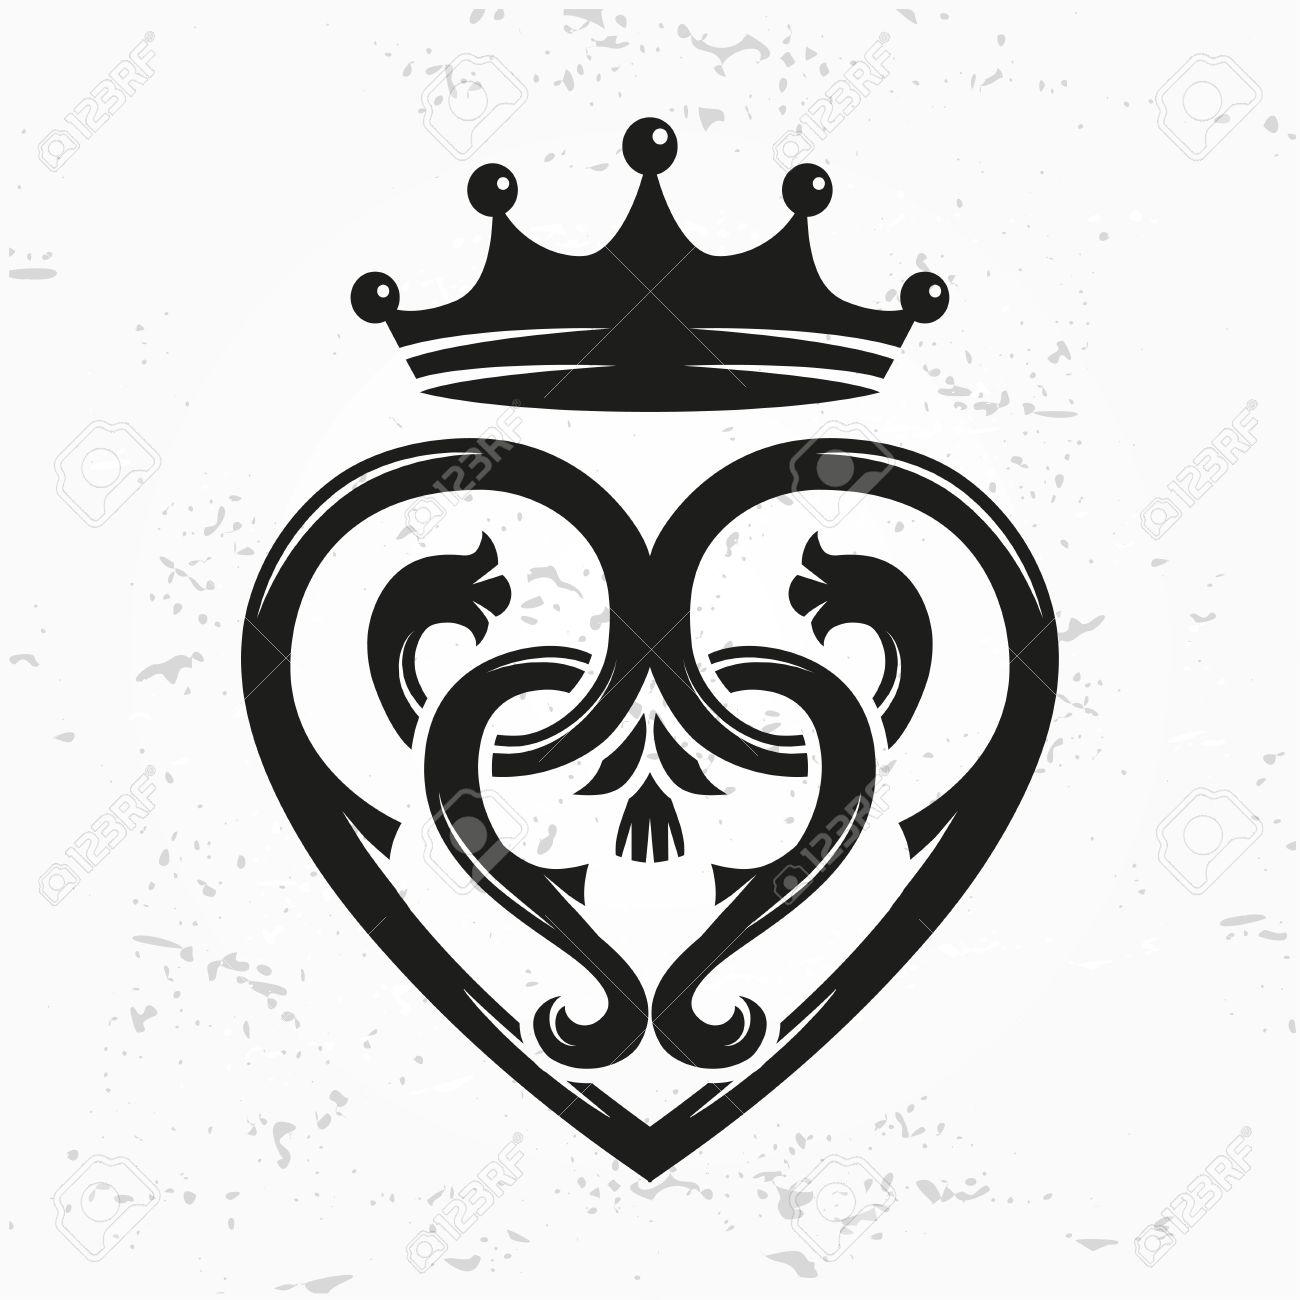 Luckenbooth brooch vector design element. Vintage Scottish heart shape with crown symbol logo concept. Valentine day or wedding illustration on grunge background - 52794905